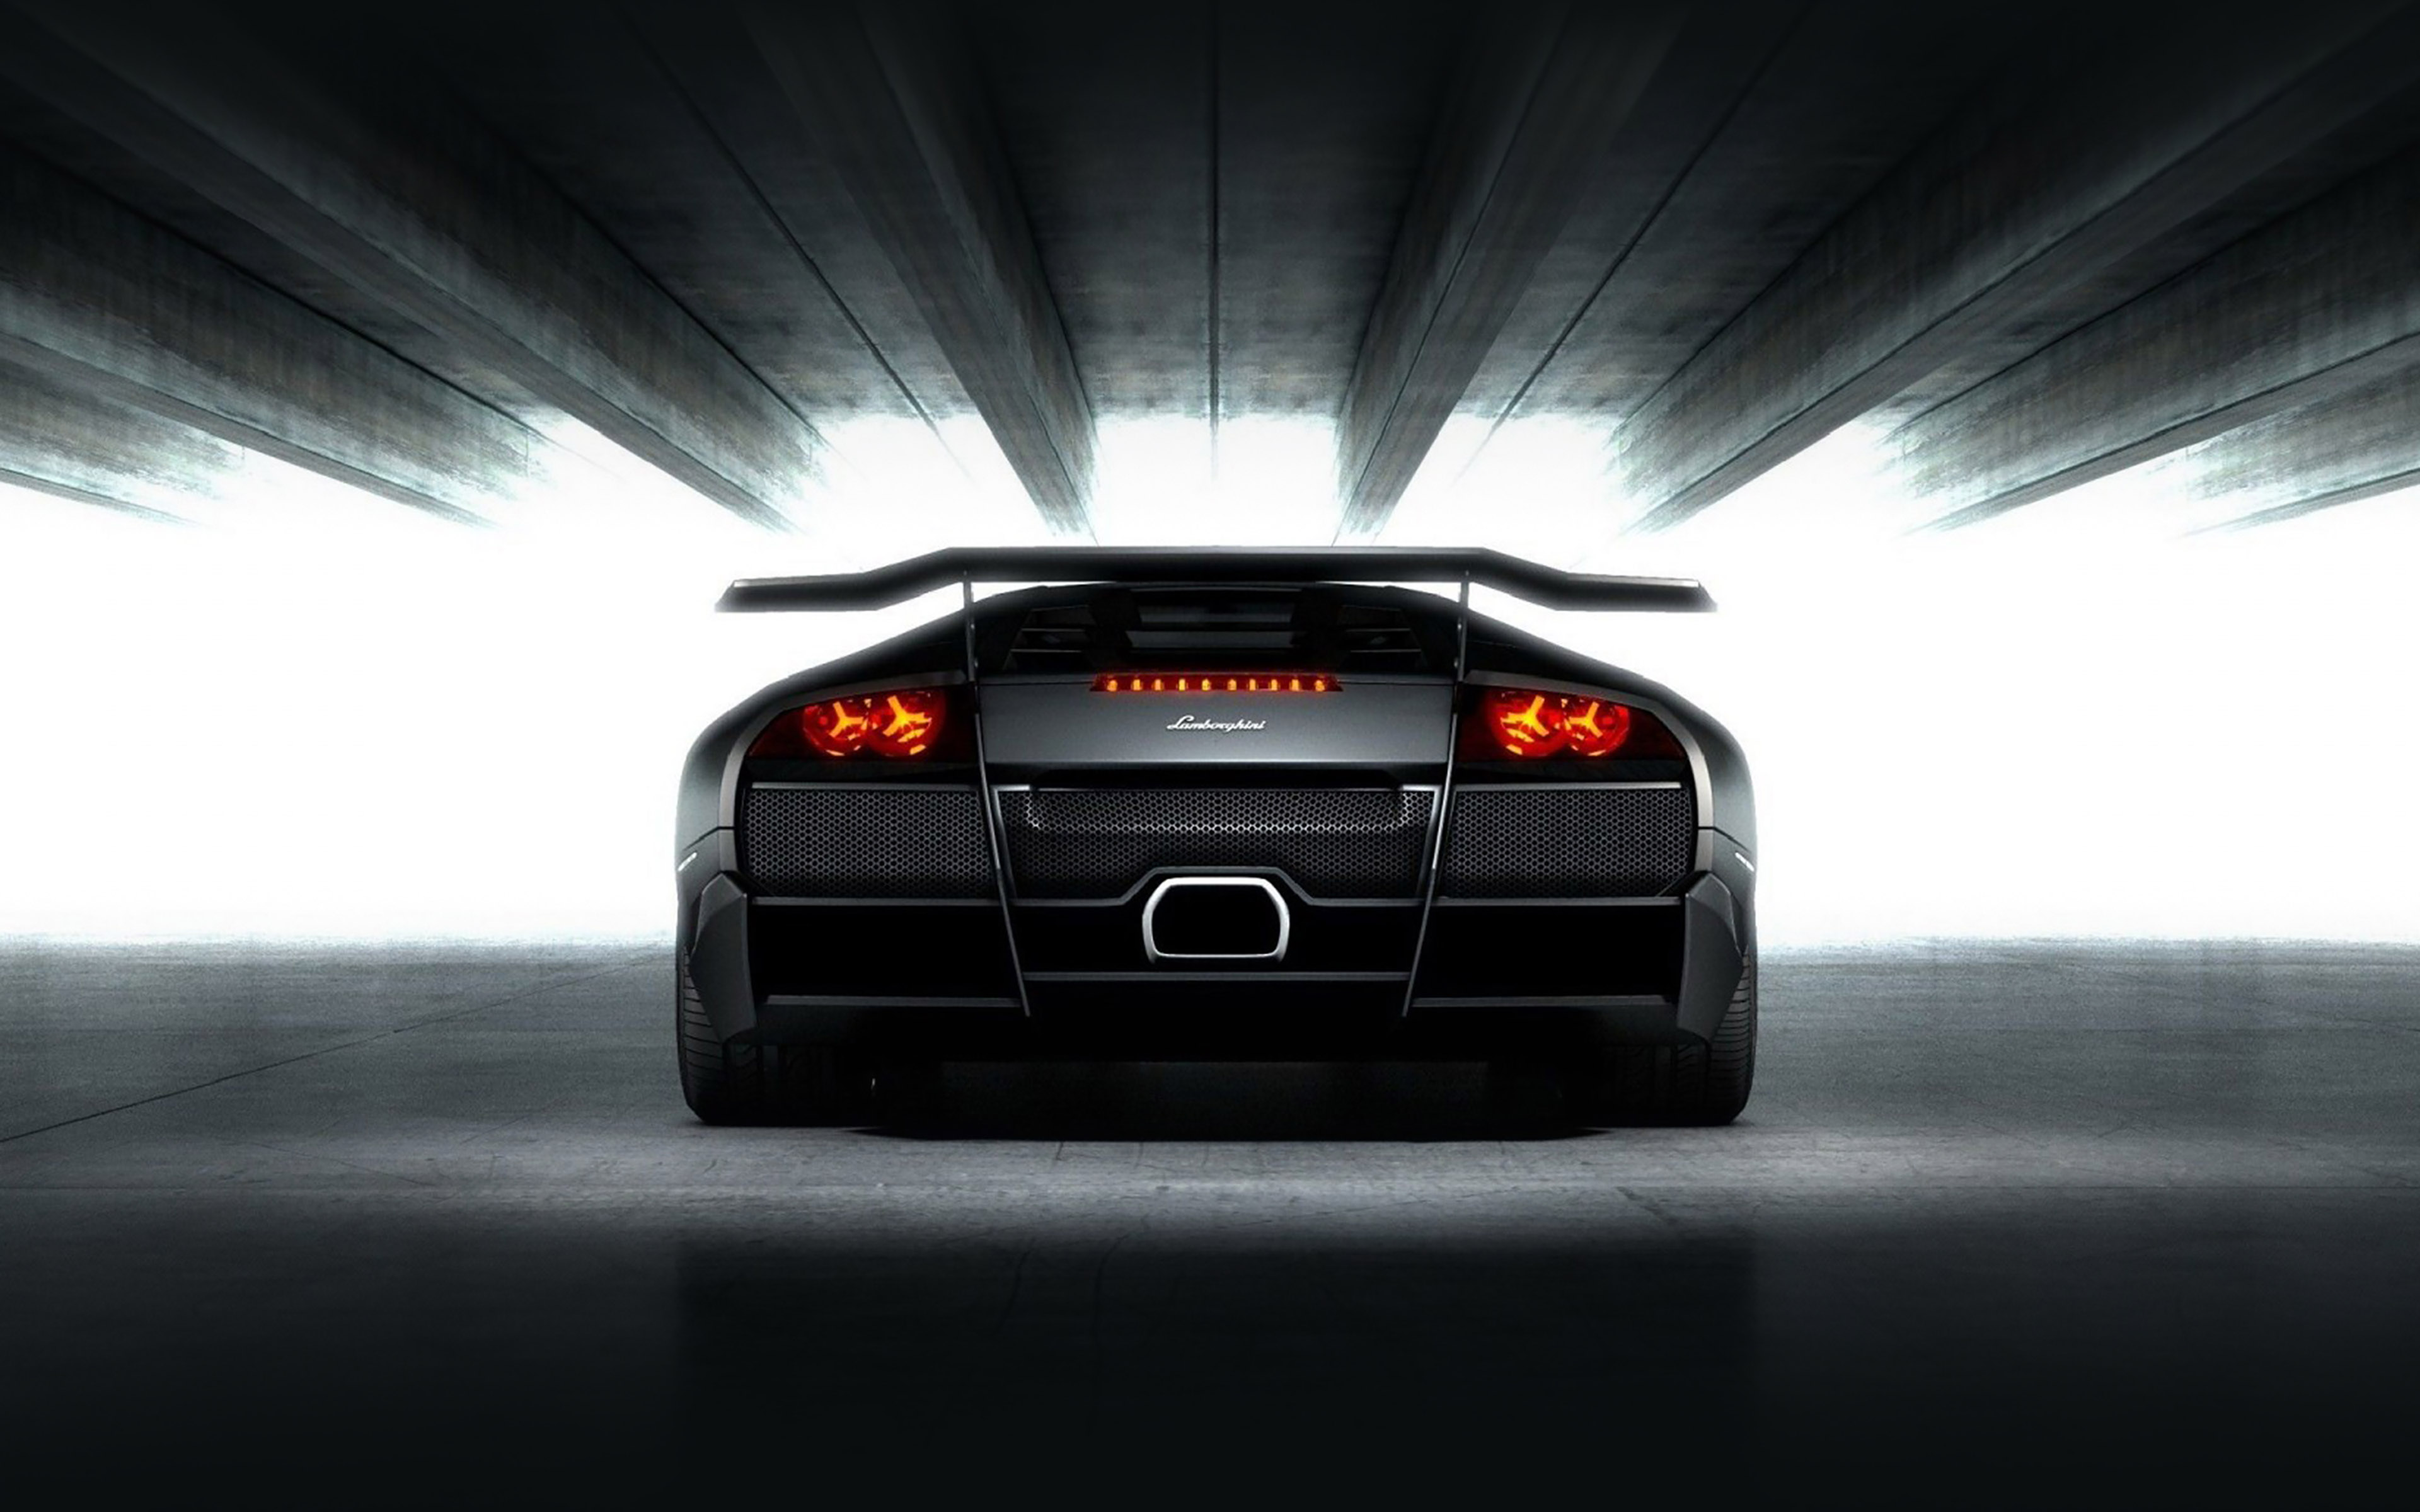 Fall City Wallpaper Hd Me64 Lamborghini In My Garage Car Papers Co